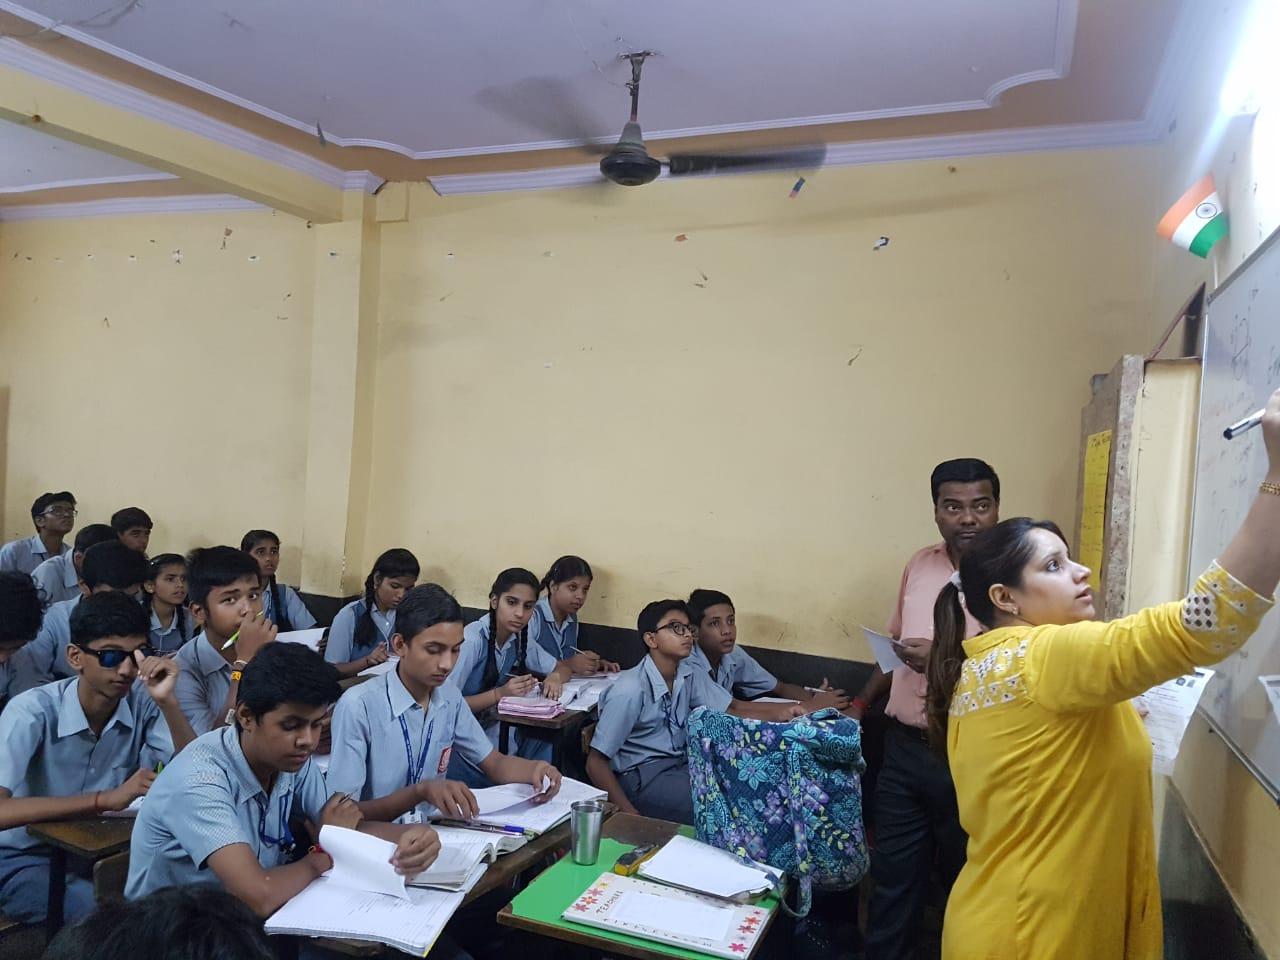 Mother mary school Delhi.jpeg